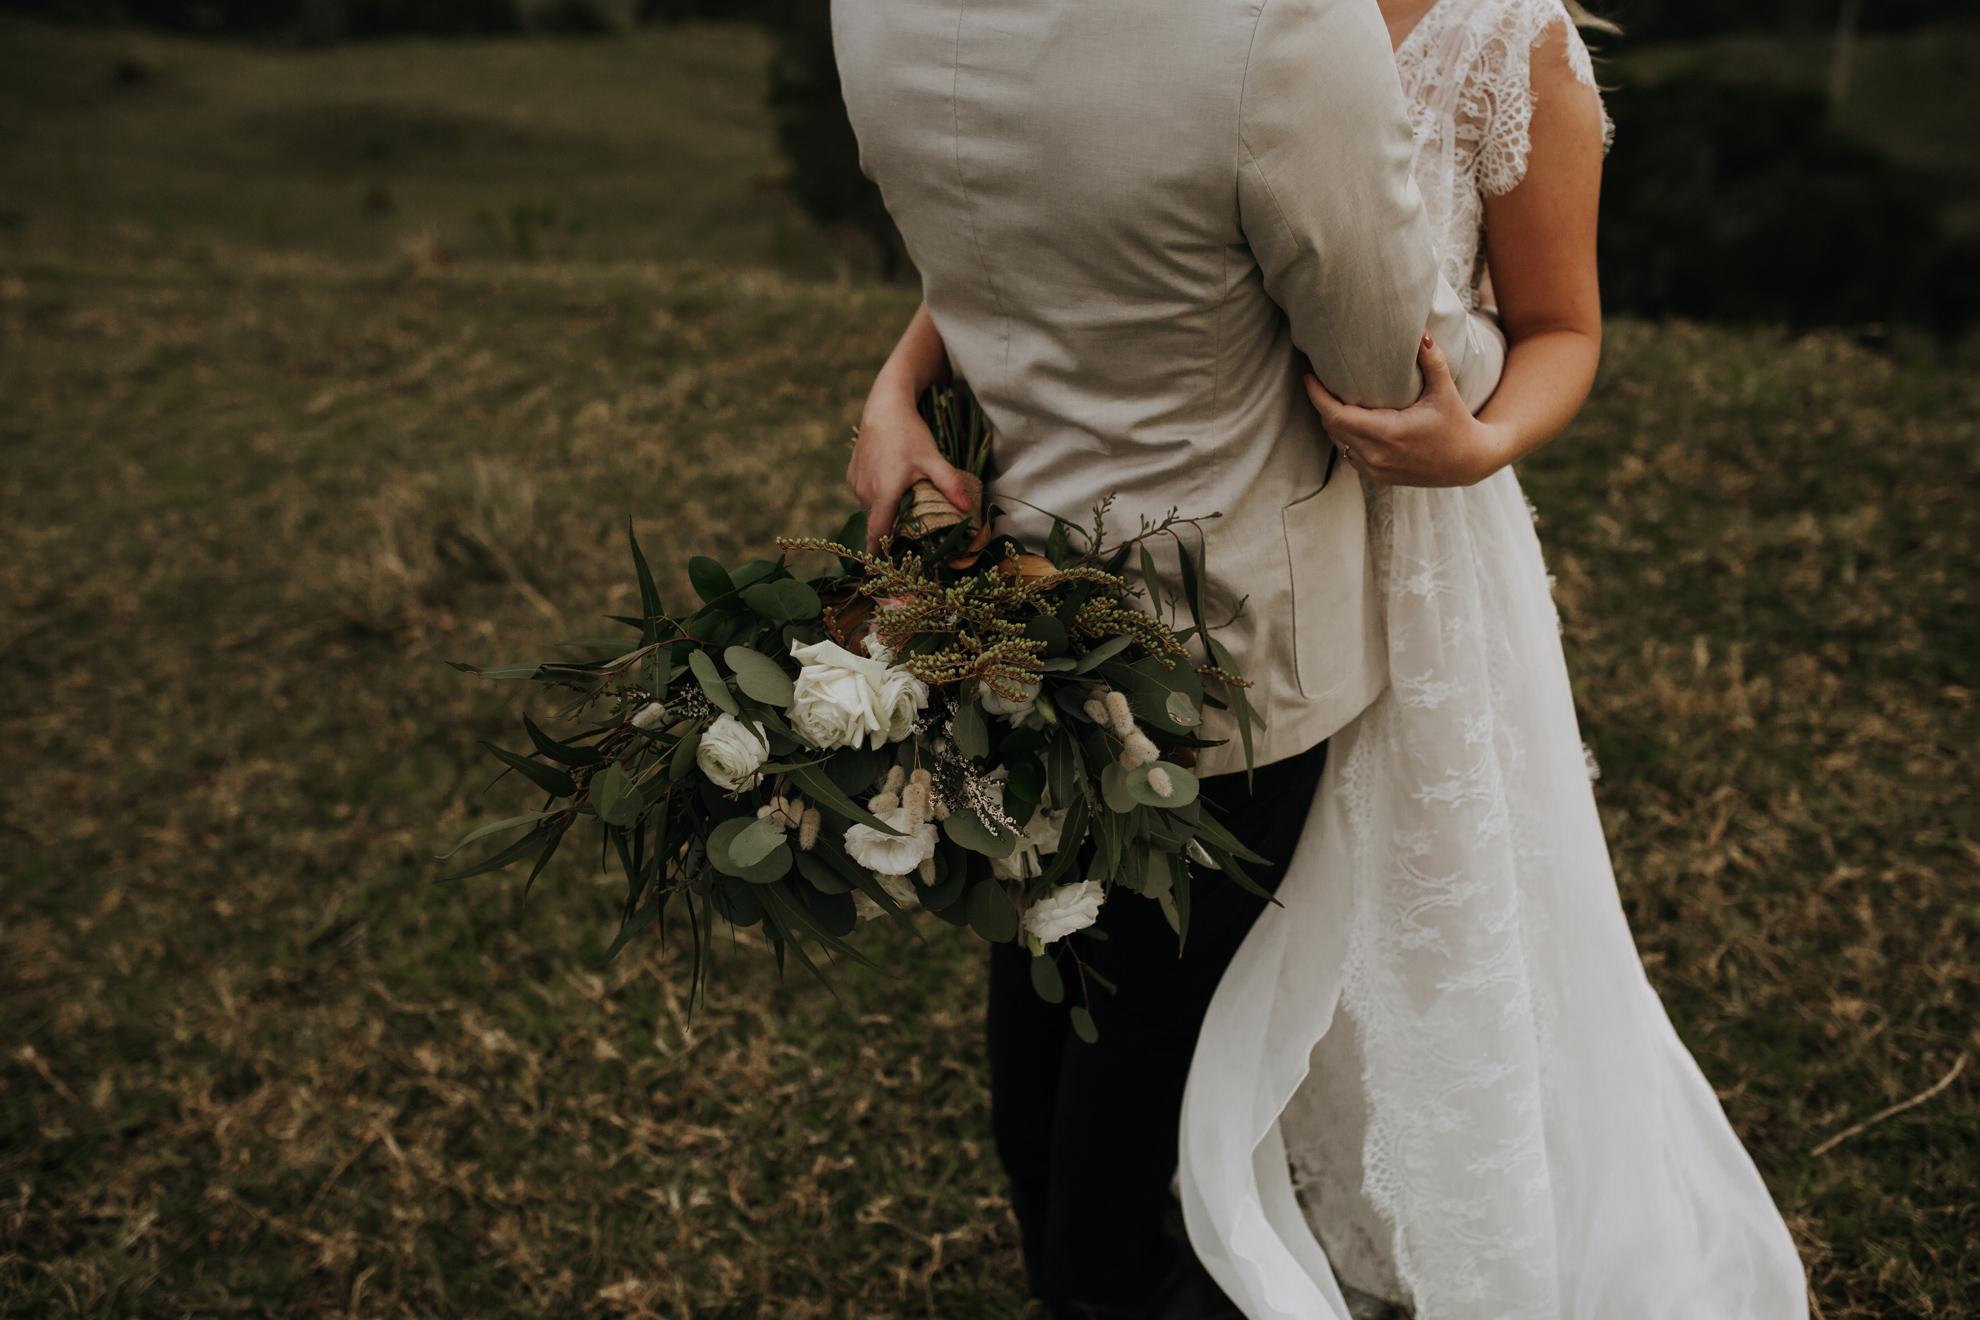 065-Kirby_Lewis_Maleny_Manor_Wedding.jpg